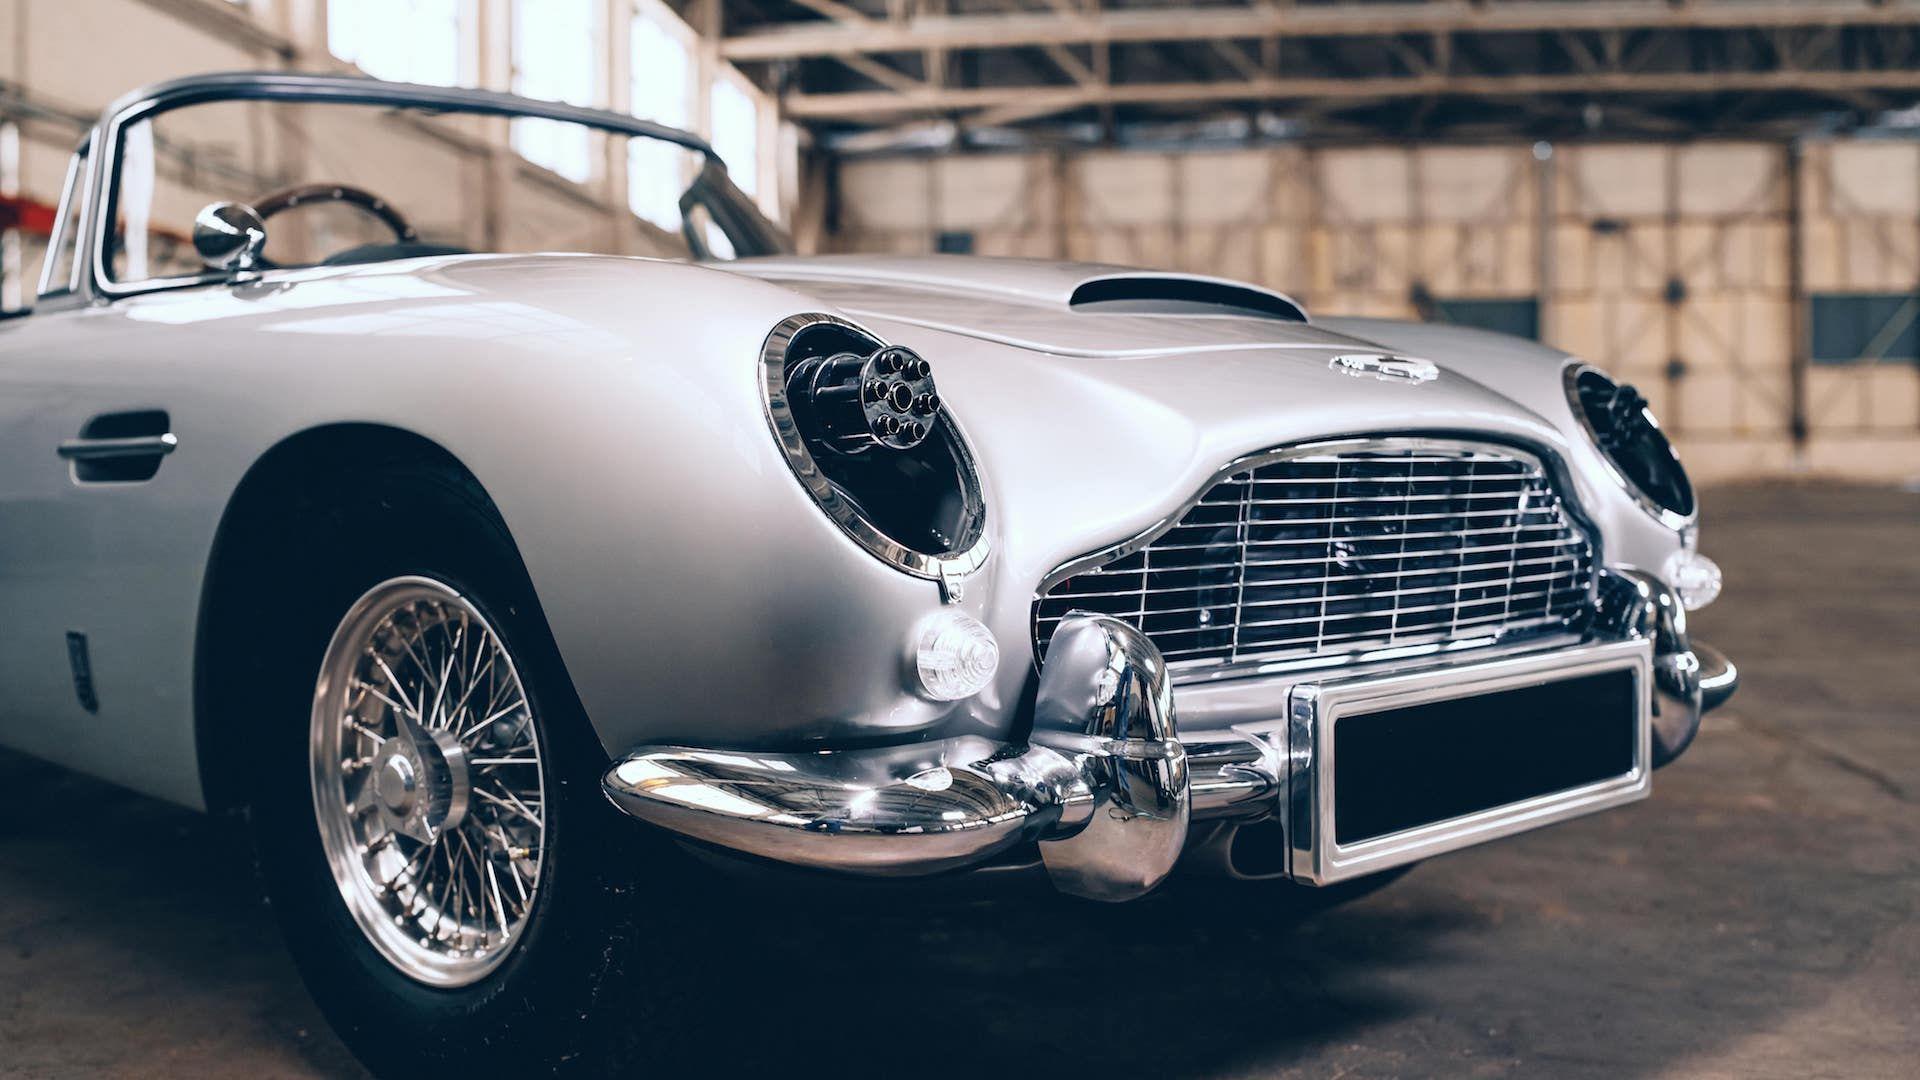 Aston-Martin-DB5-Junior-James-Bond-Edition-5